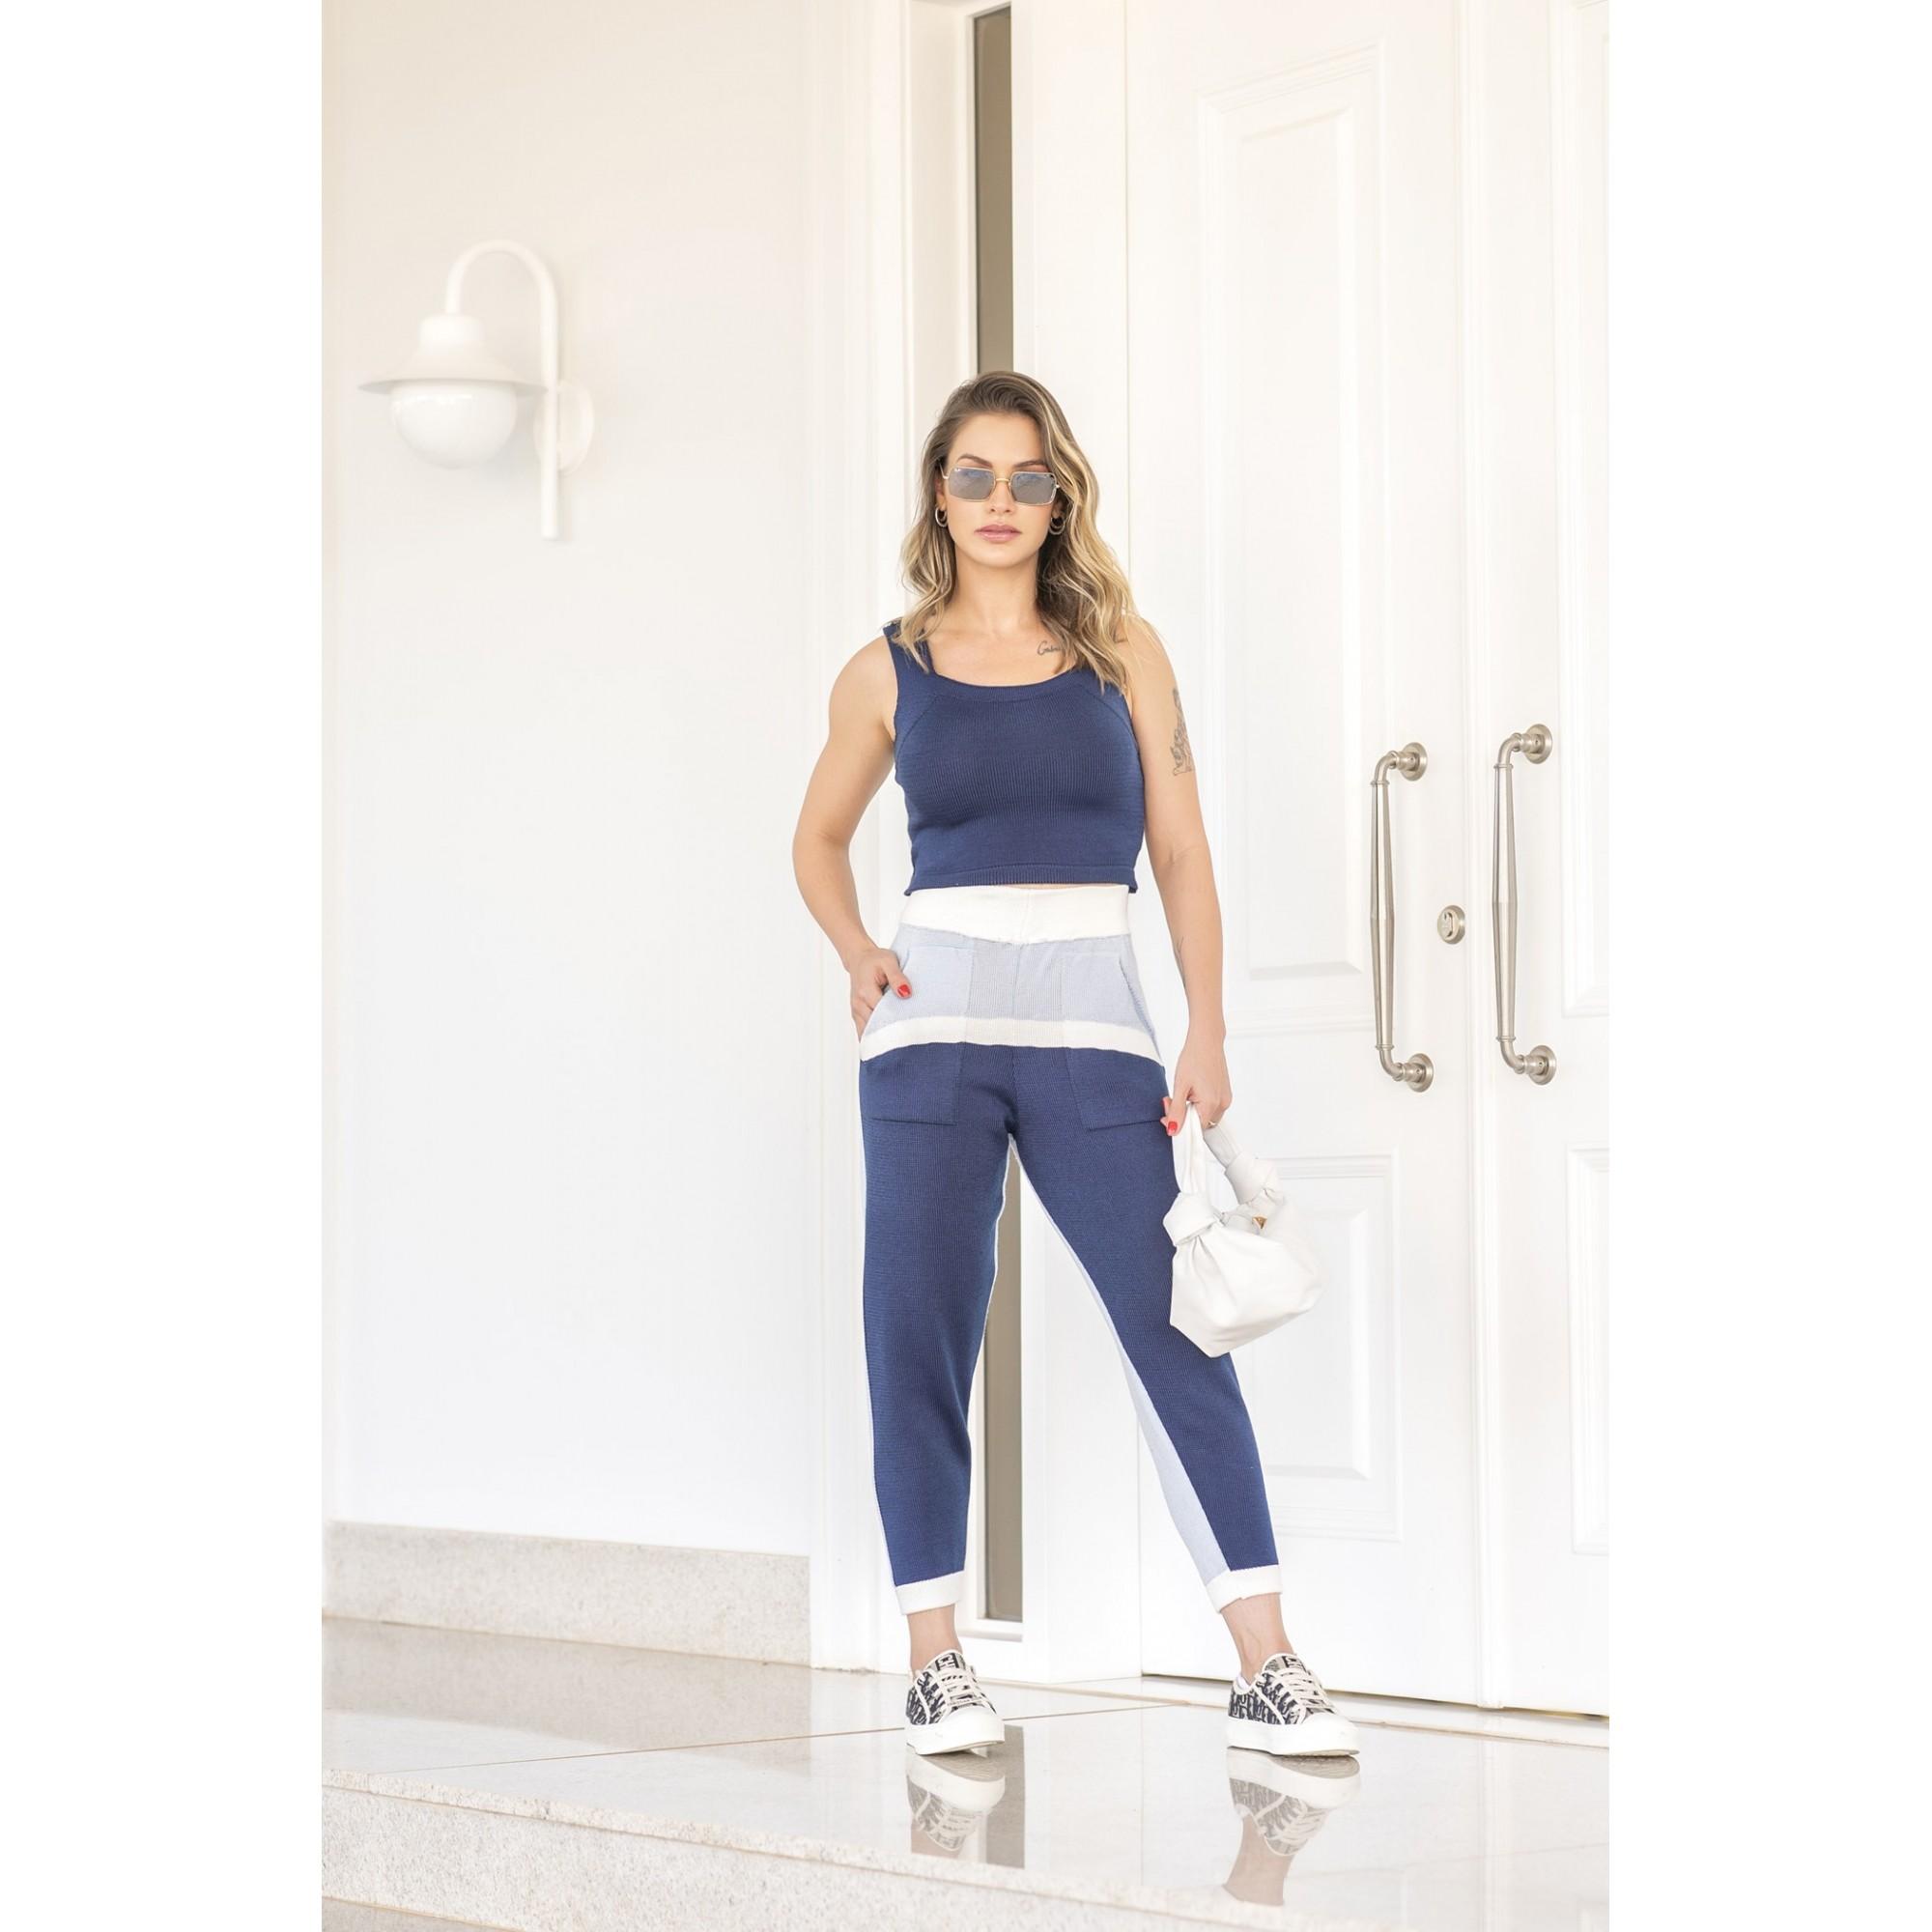 Calça Larissa Jogging Vera Tricot Feminino  Natural / Azul / Marinho